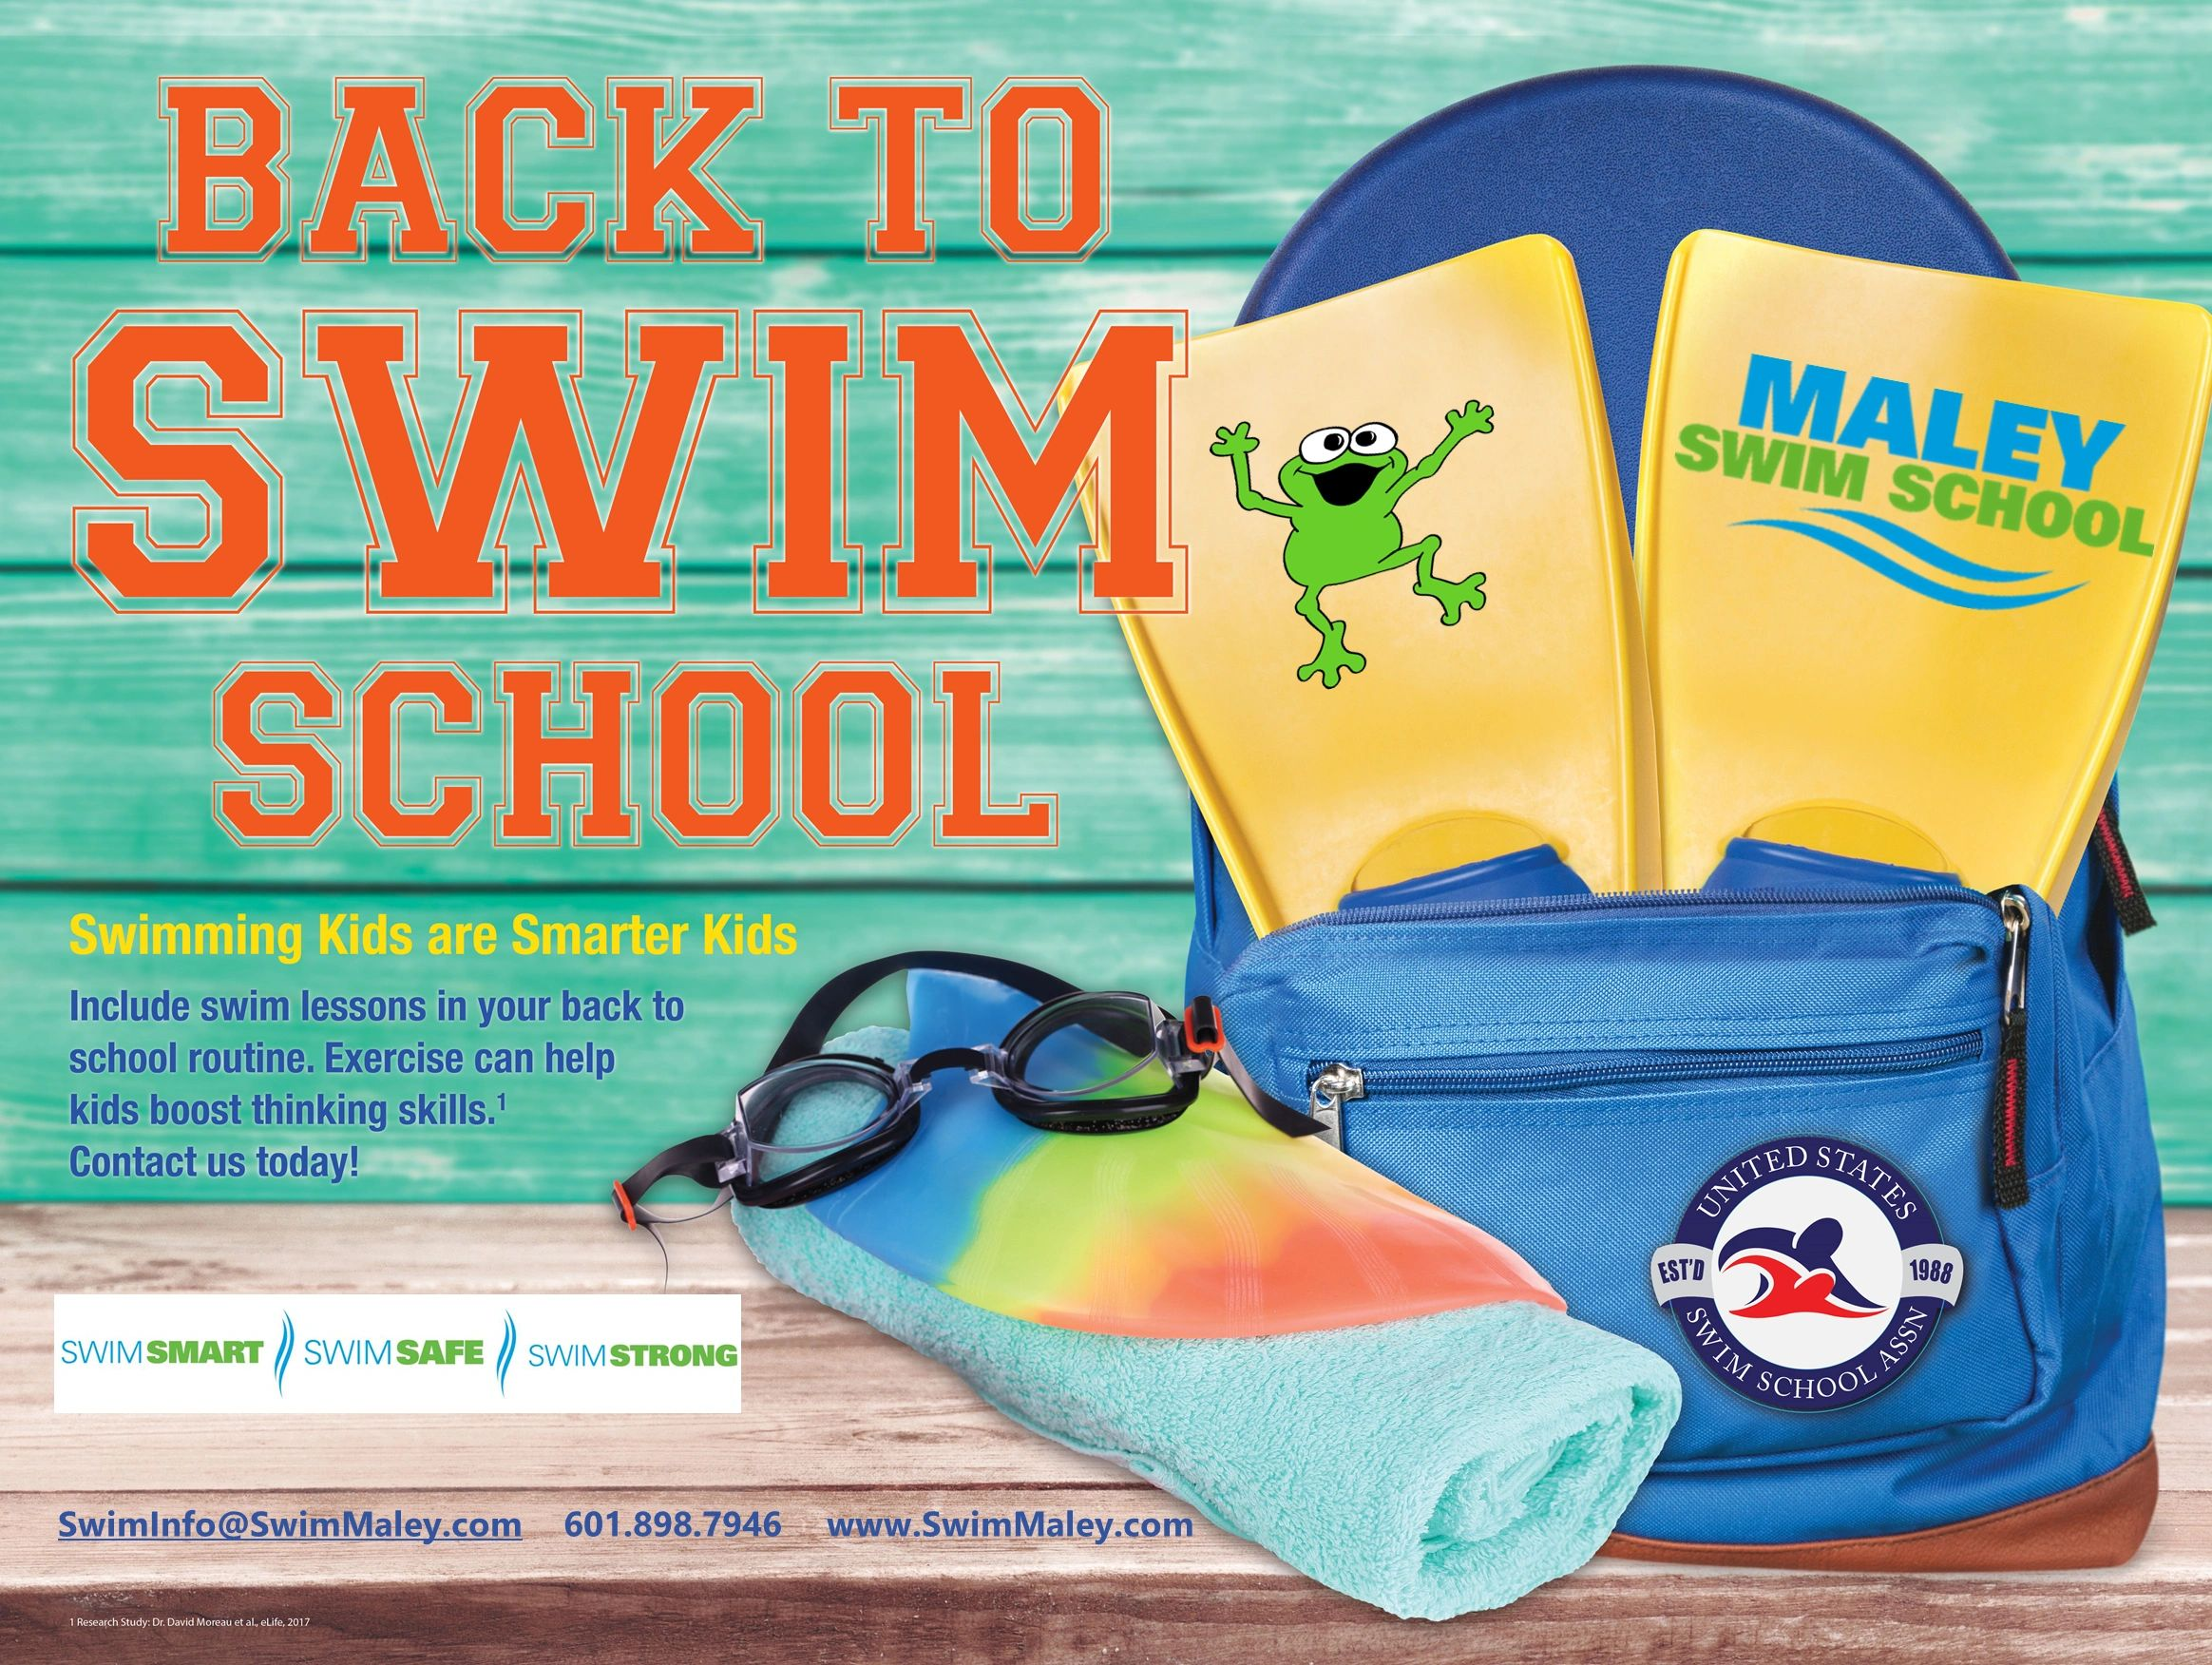 Maley Swim School